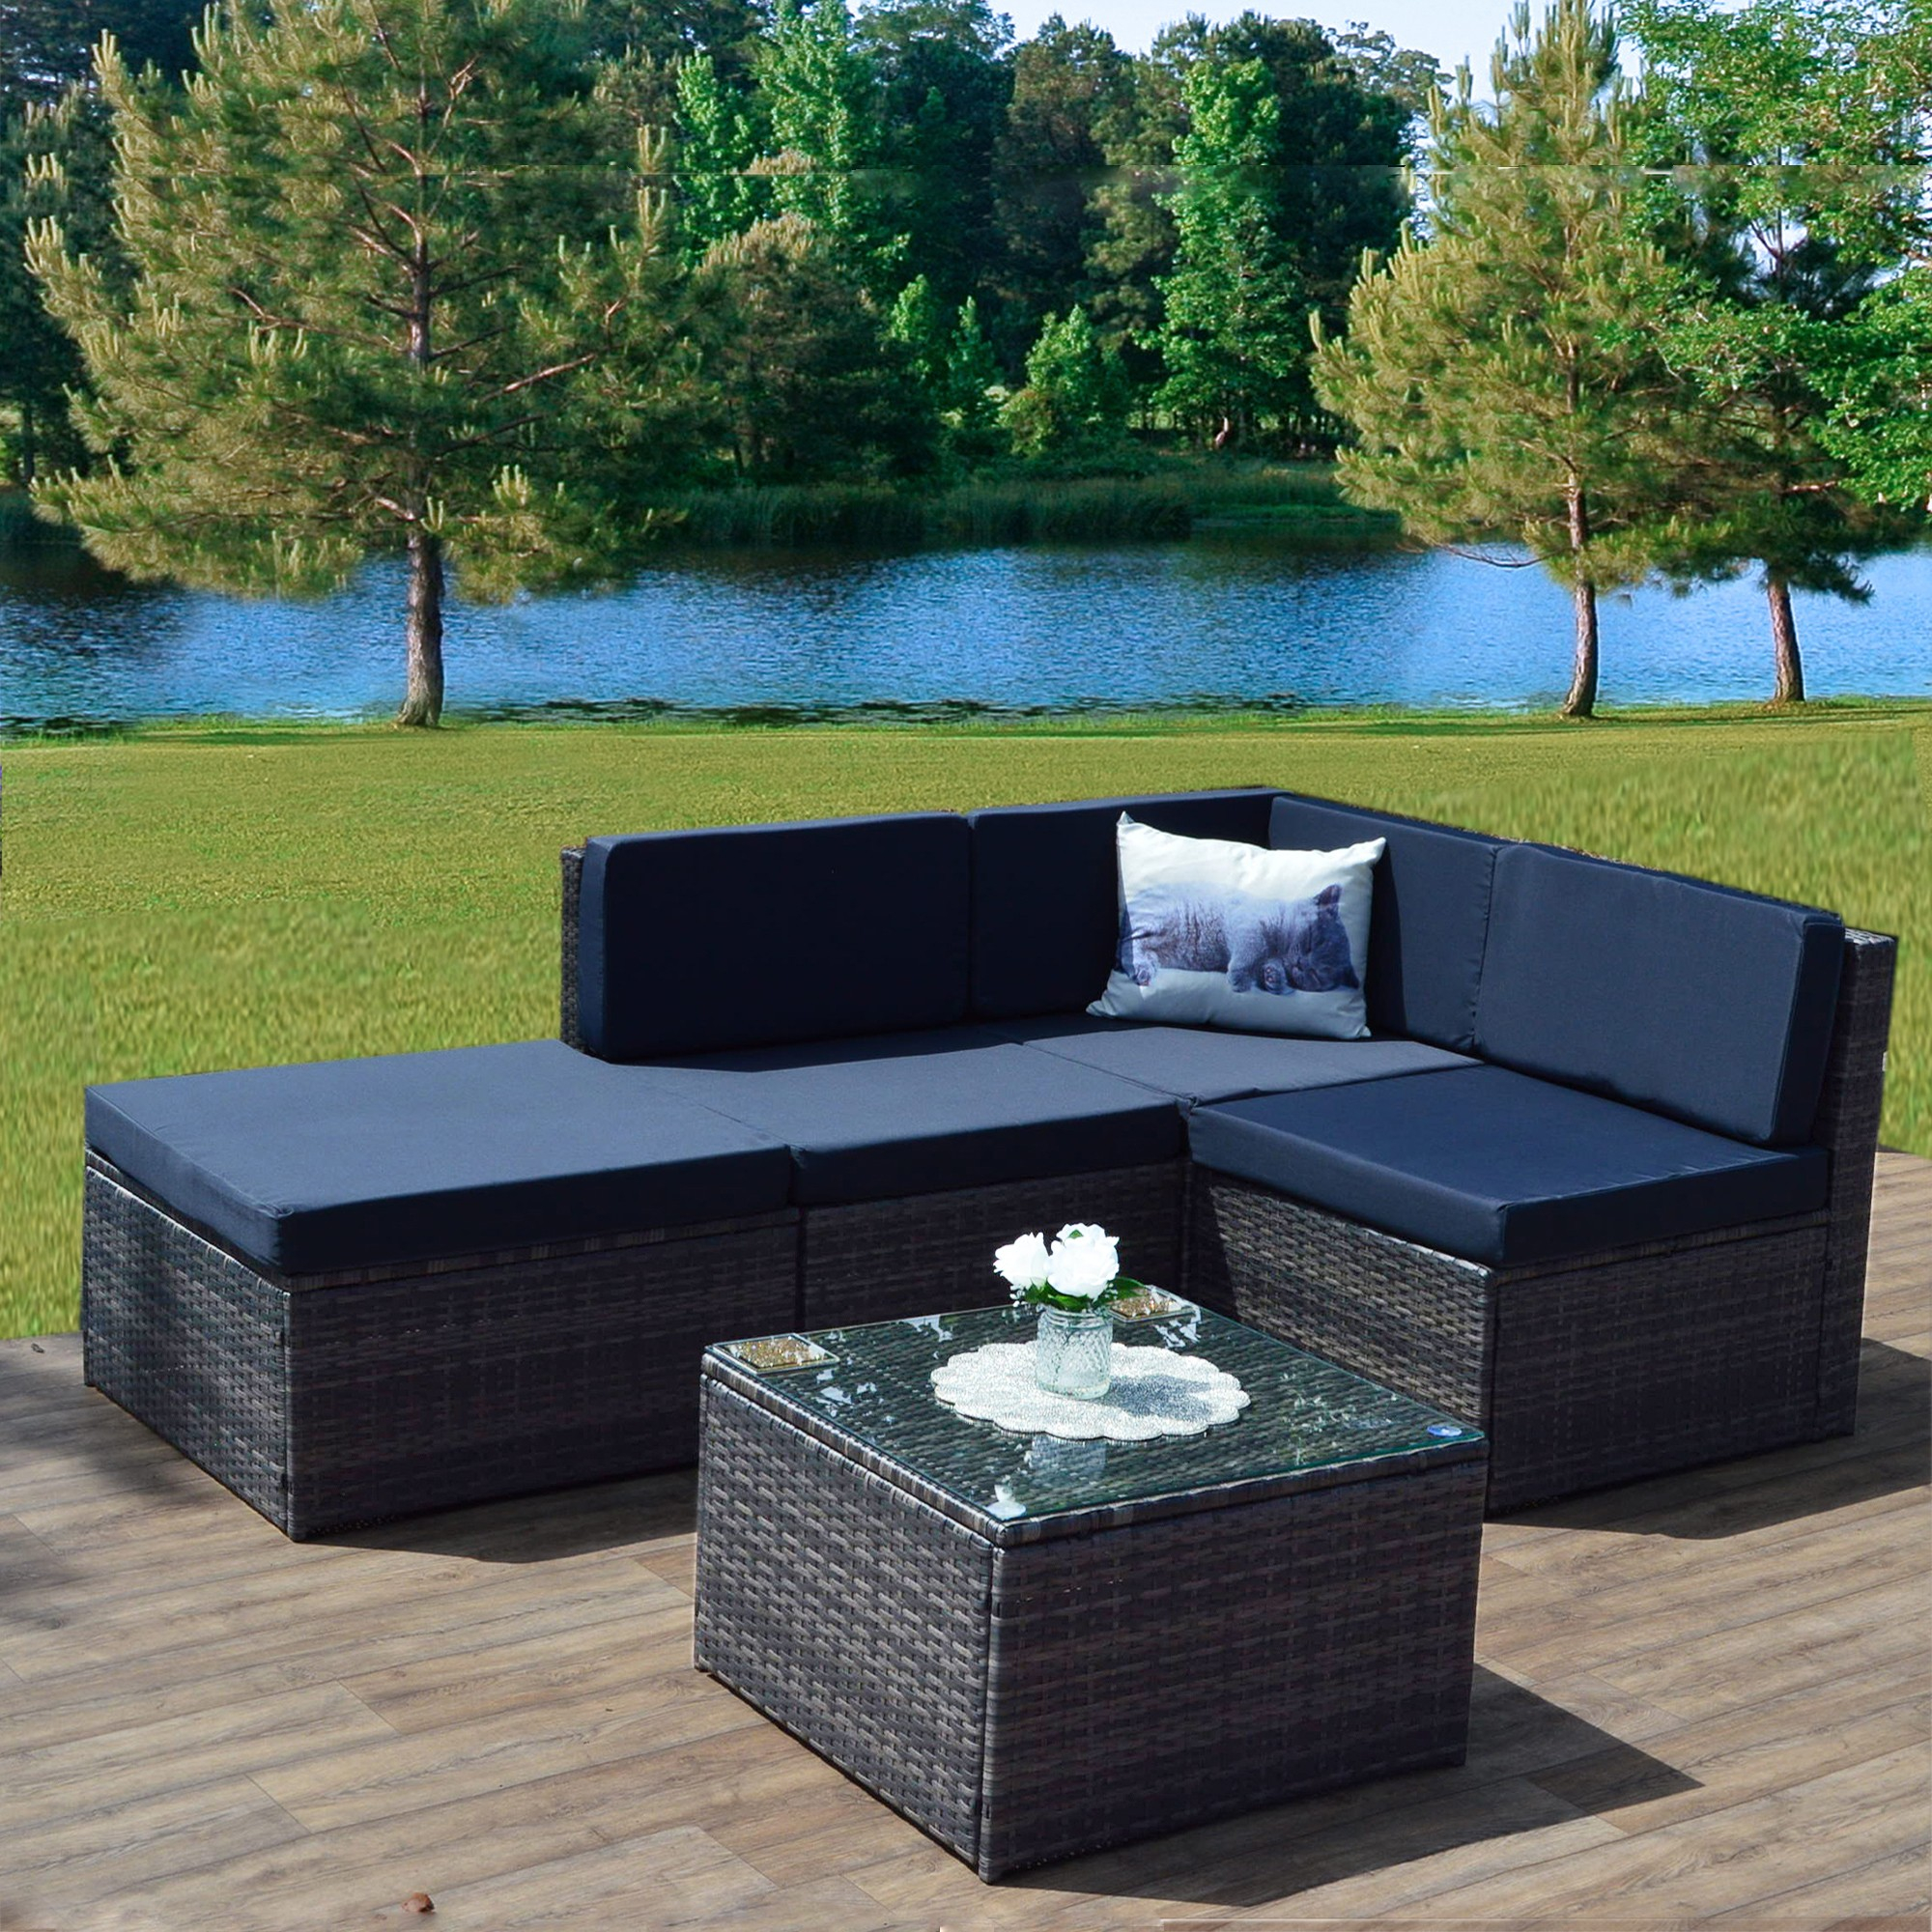 Aldi patio furniture elegant garden furniture 2015 uk interior in size 2000 x 2000